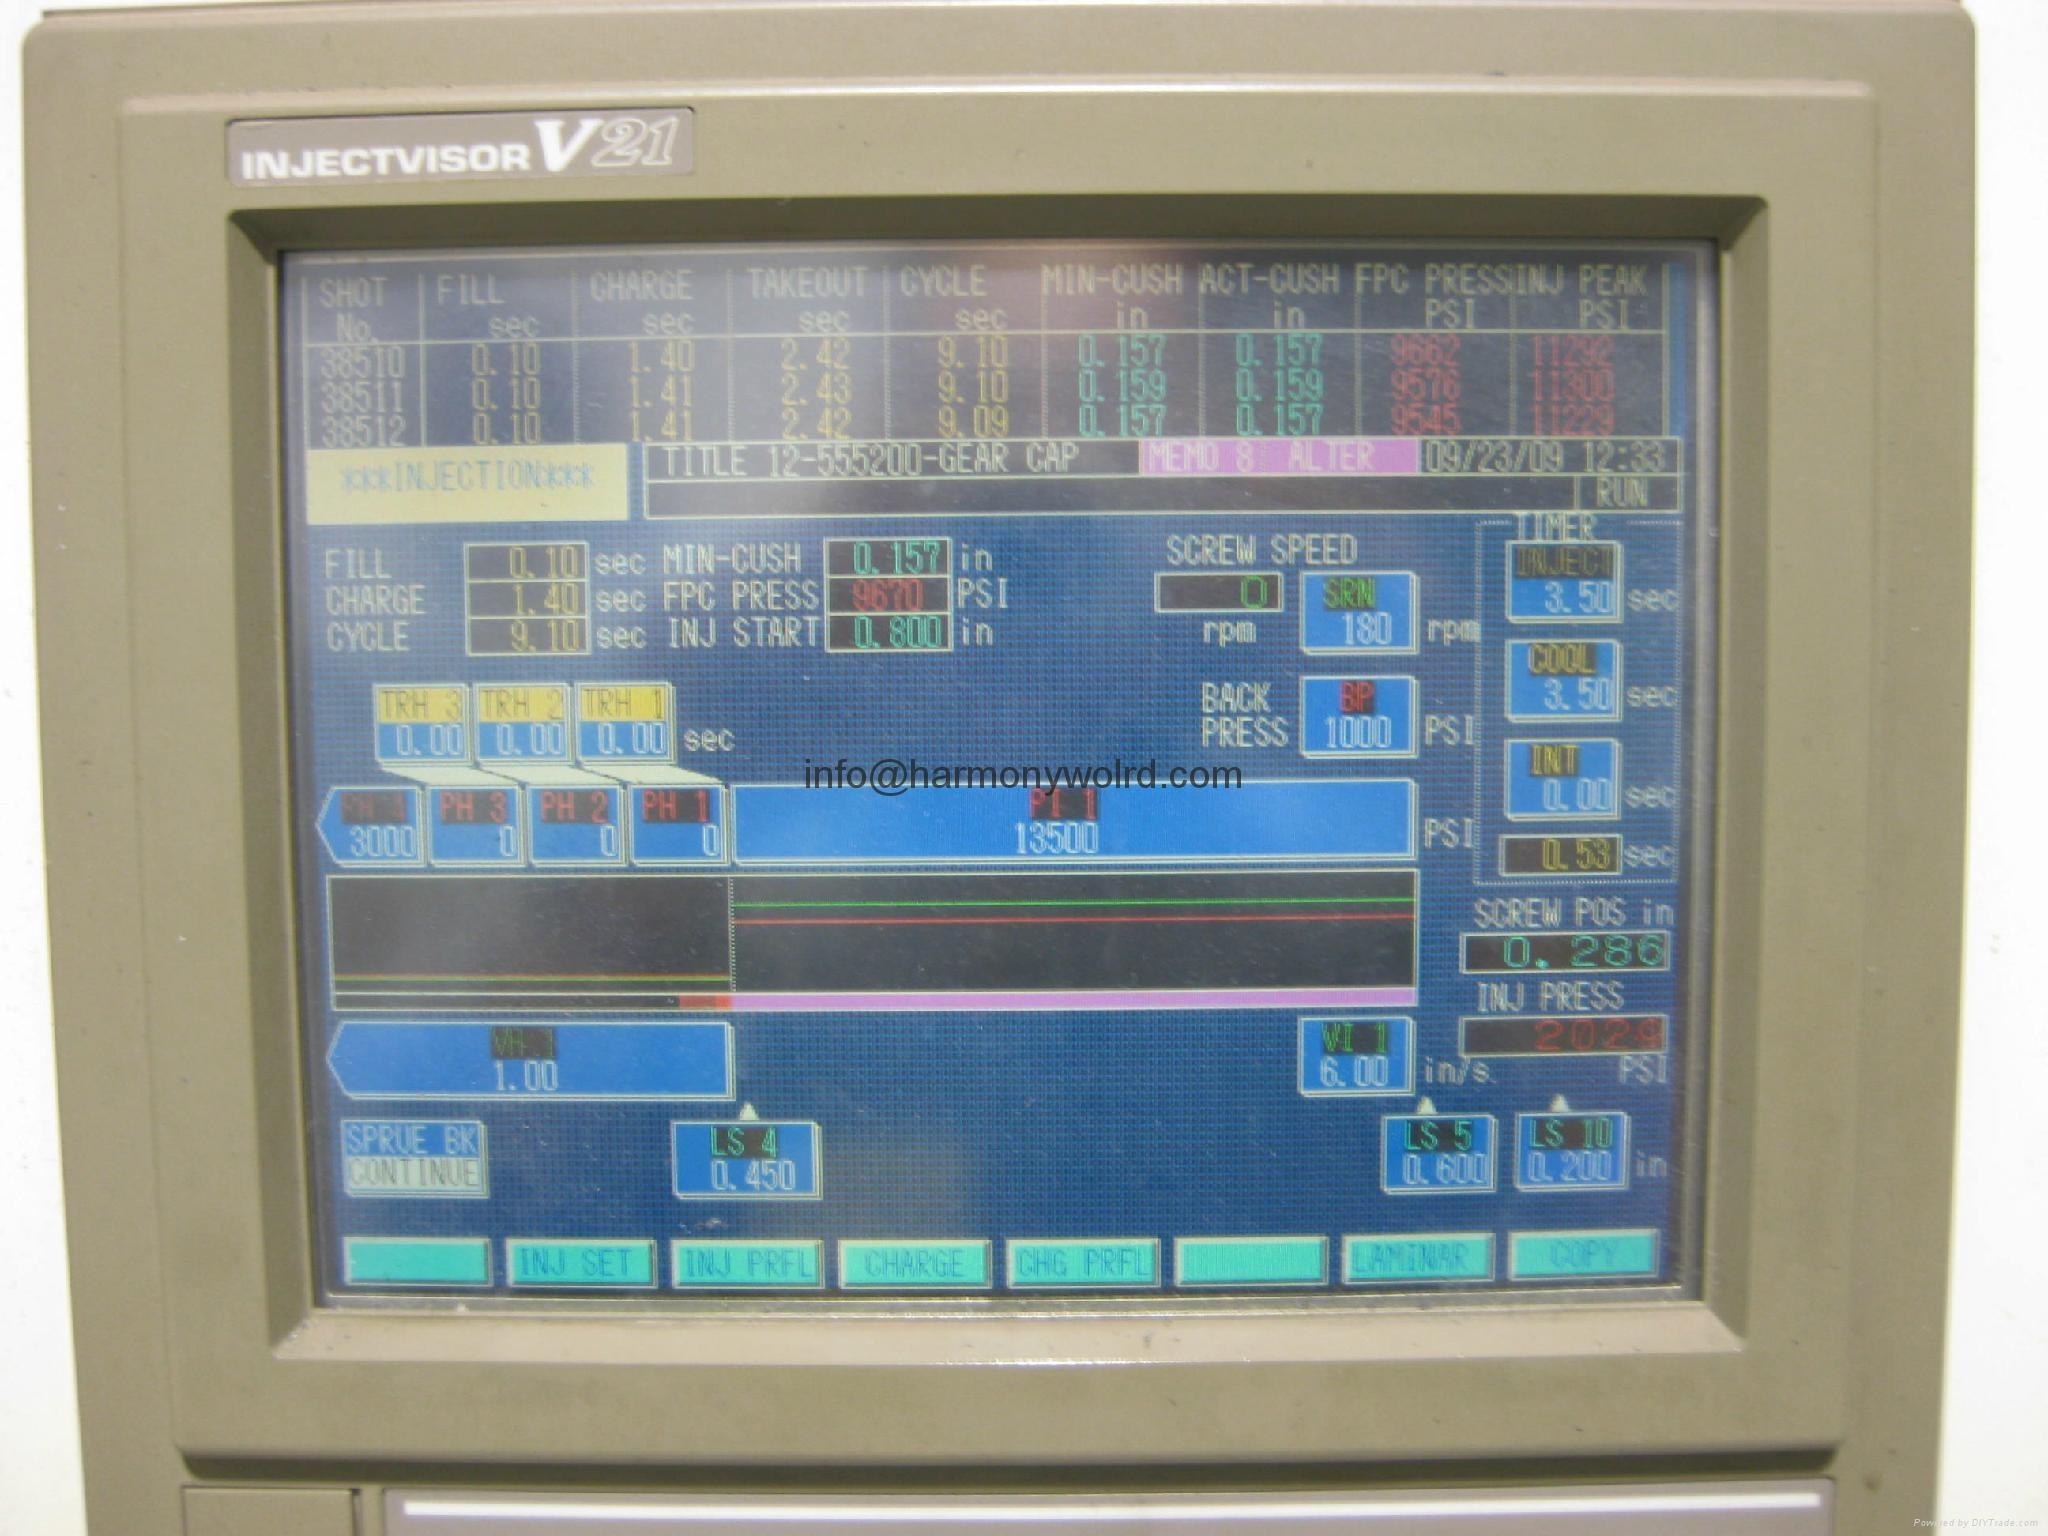 Monitor Display For Toshiba Injection Molding Machine injectvisor VL/V10/V21/V30 2